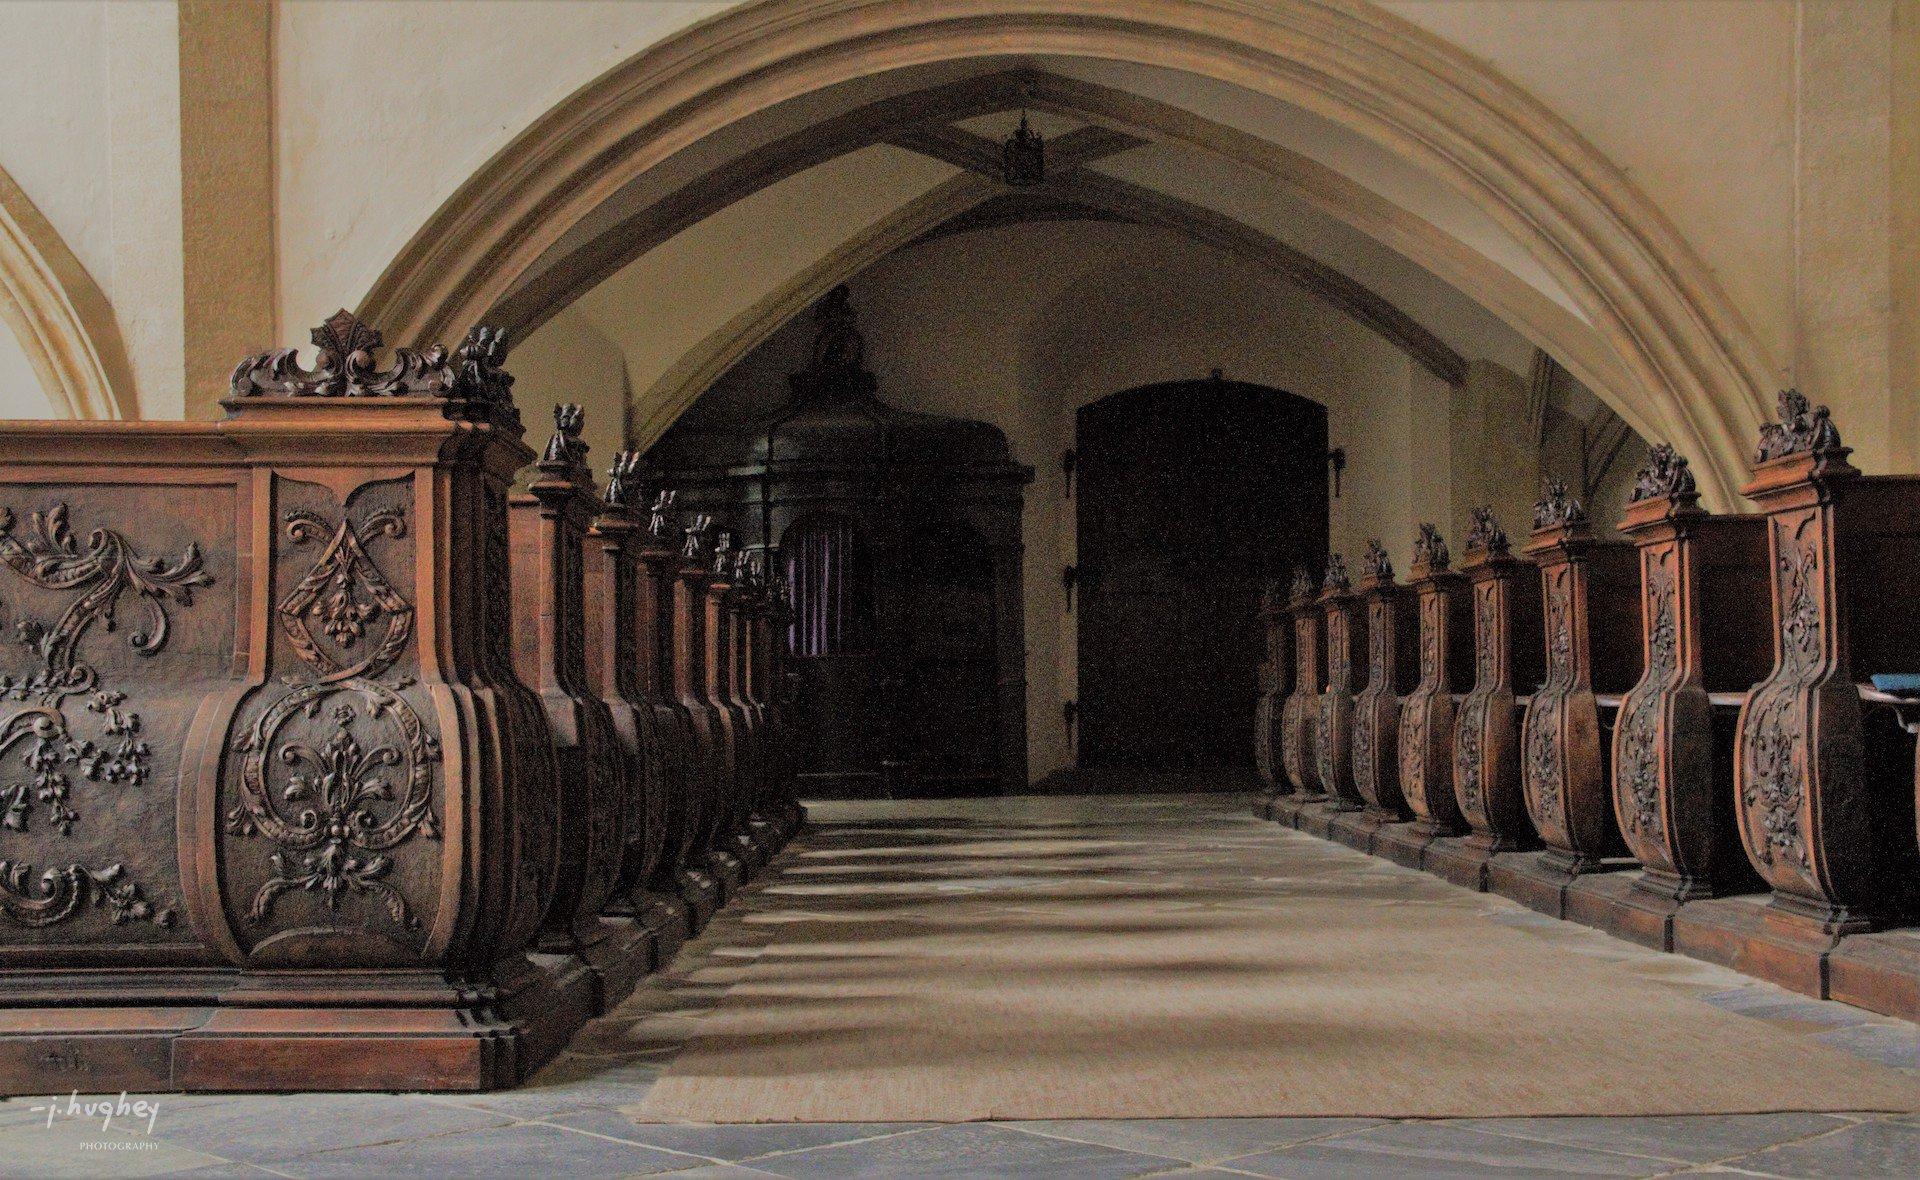 John Hughey Contemplative Fine Art Photography - St. Nikolaus